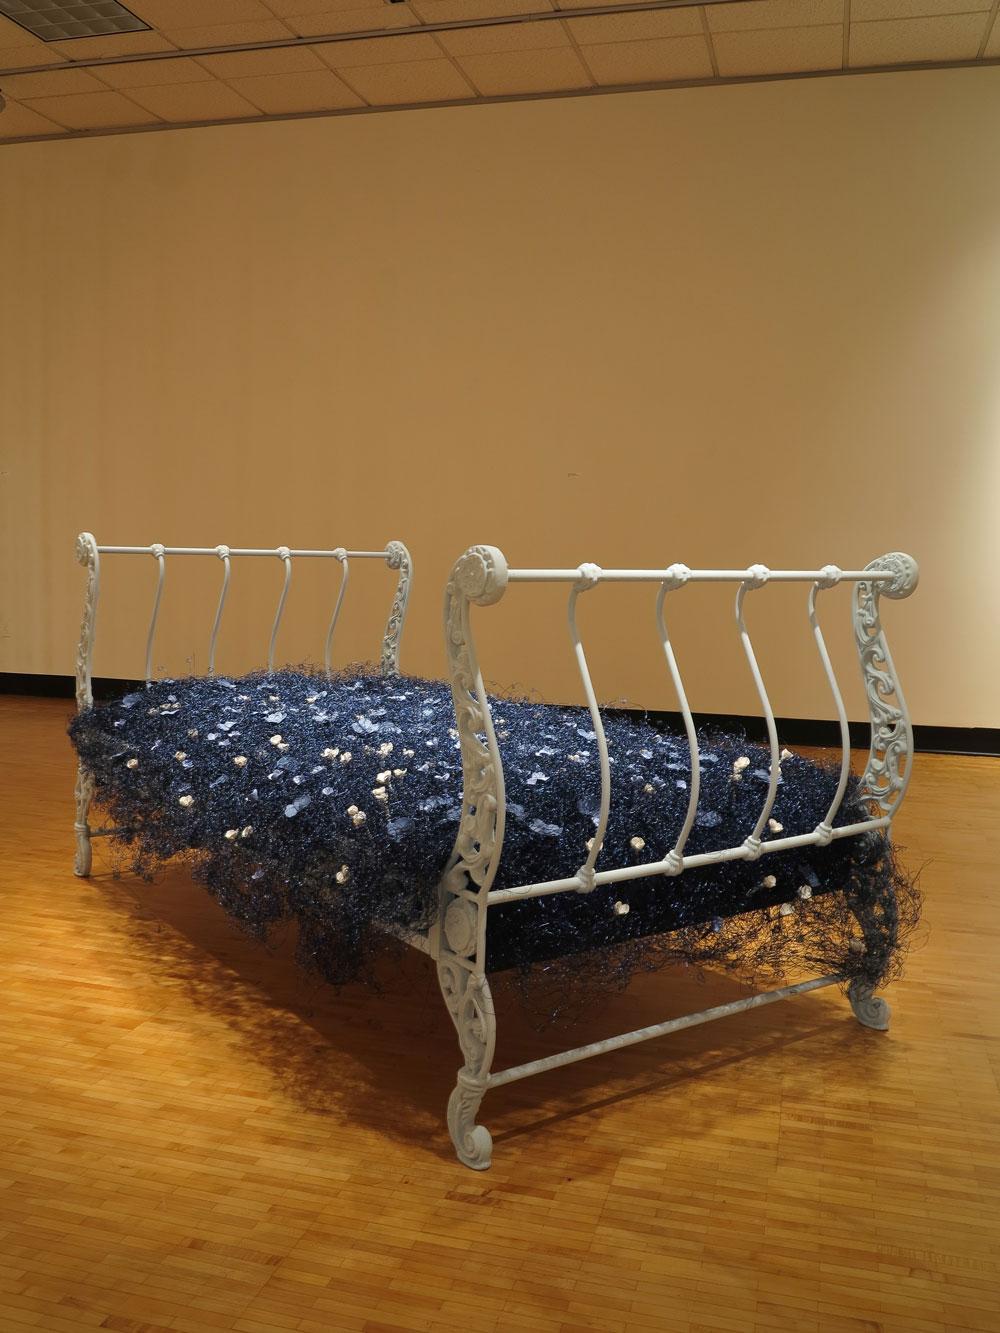 Boundless: Lauren Herzak-Bauman & Blake J. Williams